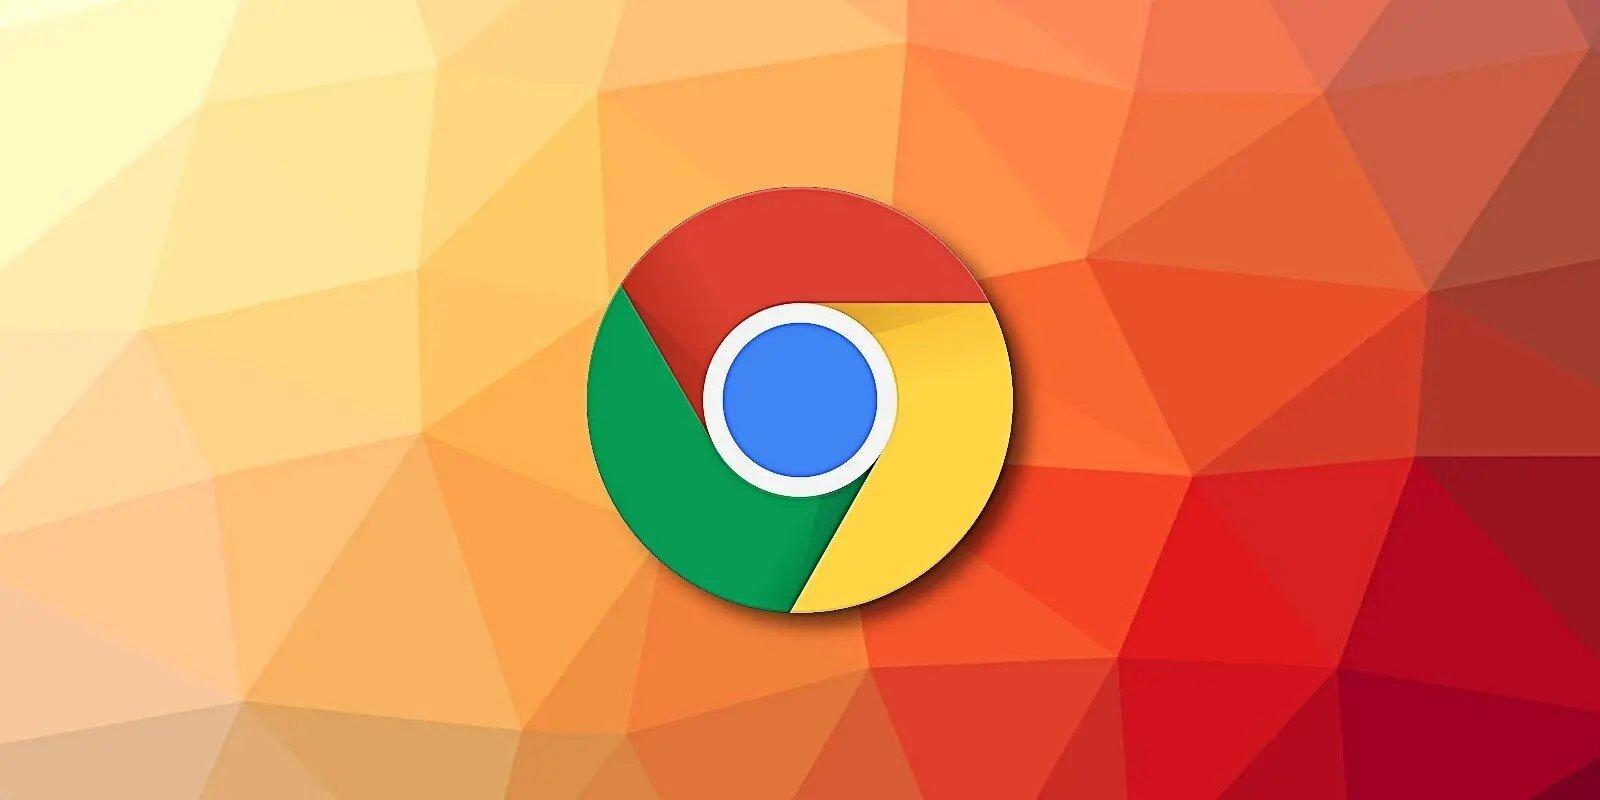 Chrome - Chrome PartitionAlloc για μειωμένη χρήση RAM